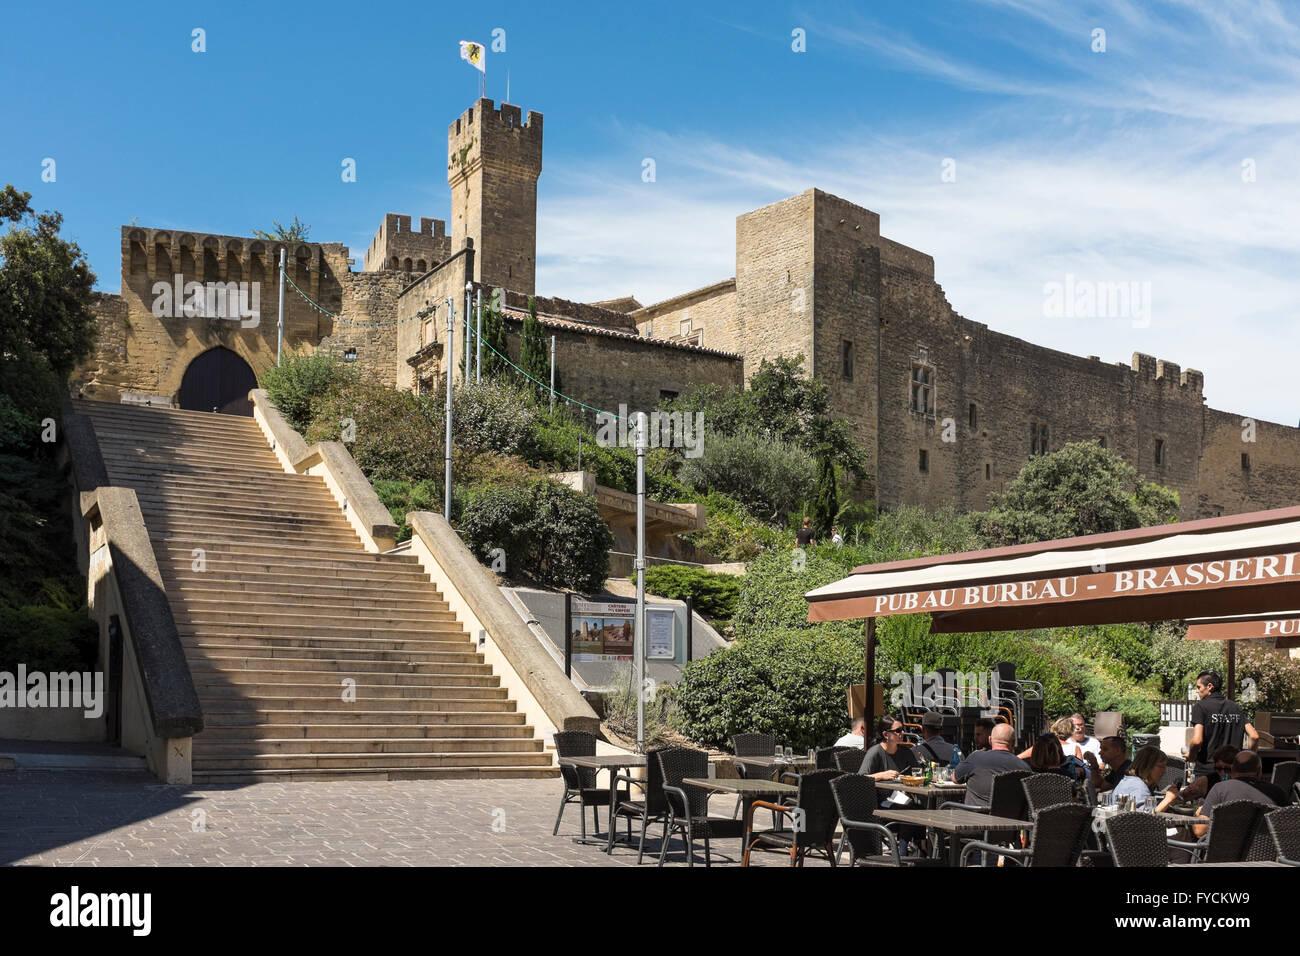 9c castle ch teau de l 39 emperi salon de provence bouches du rh ne stock photo 102926581 alamy - Fusillade salon de provence ...